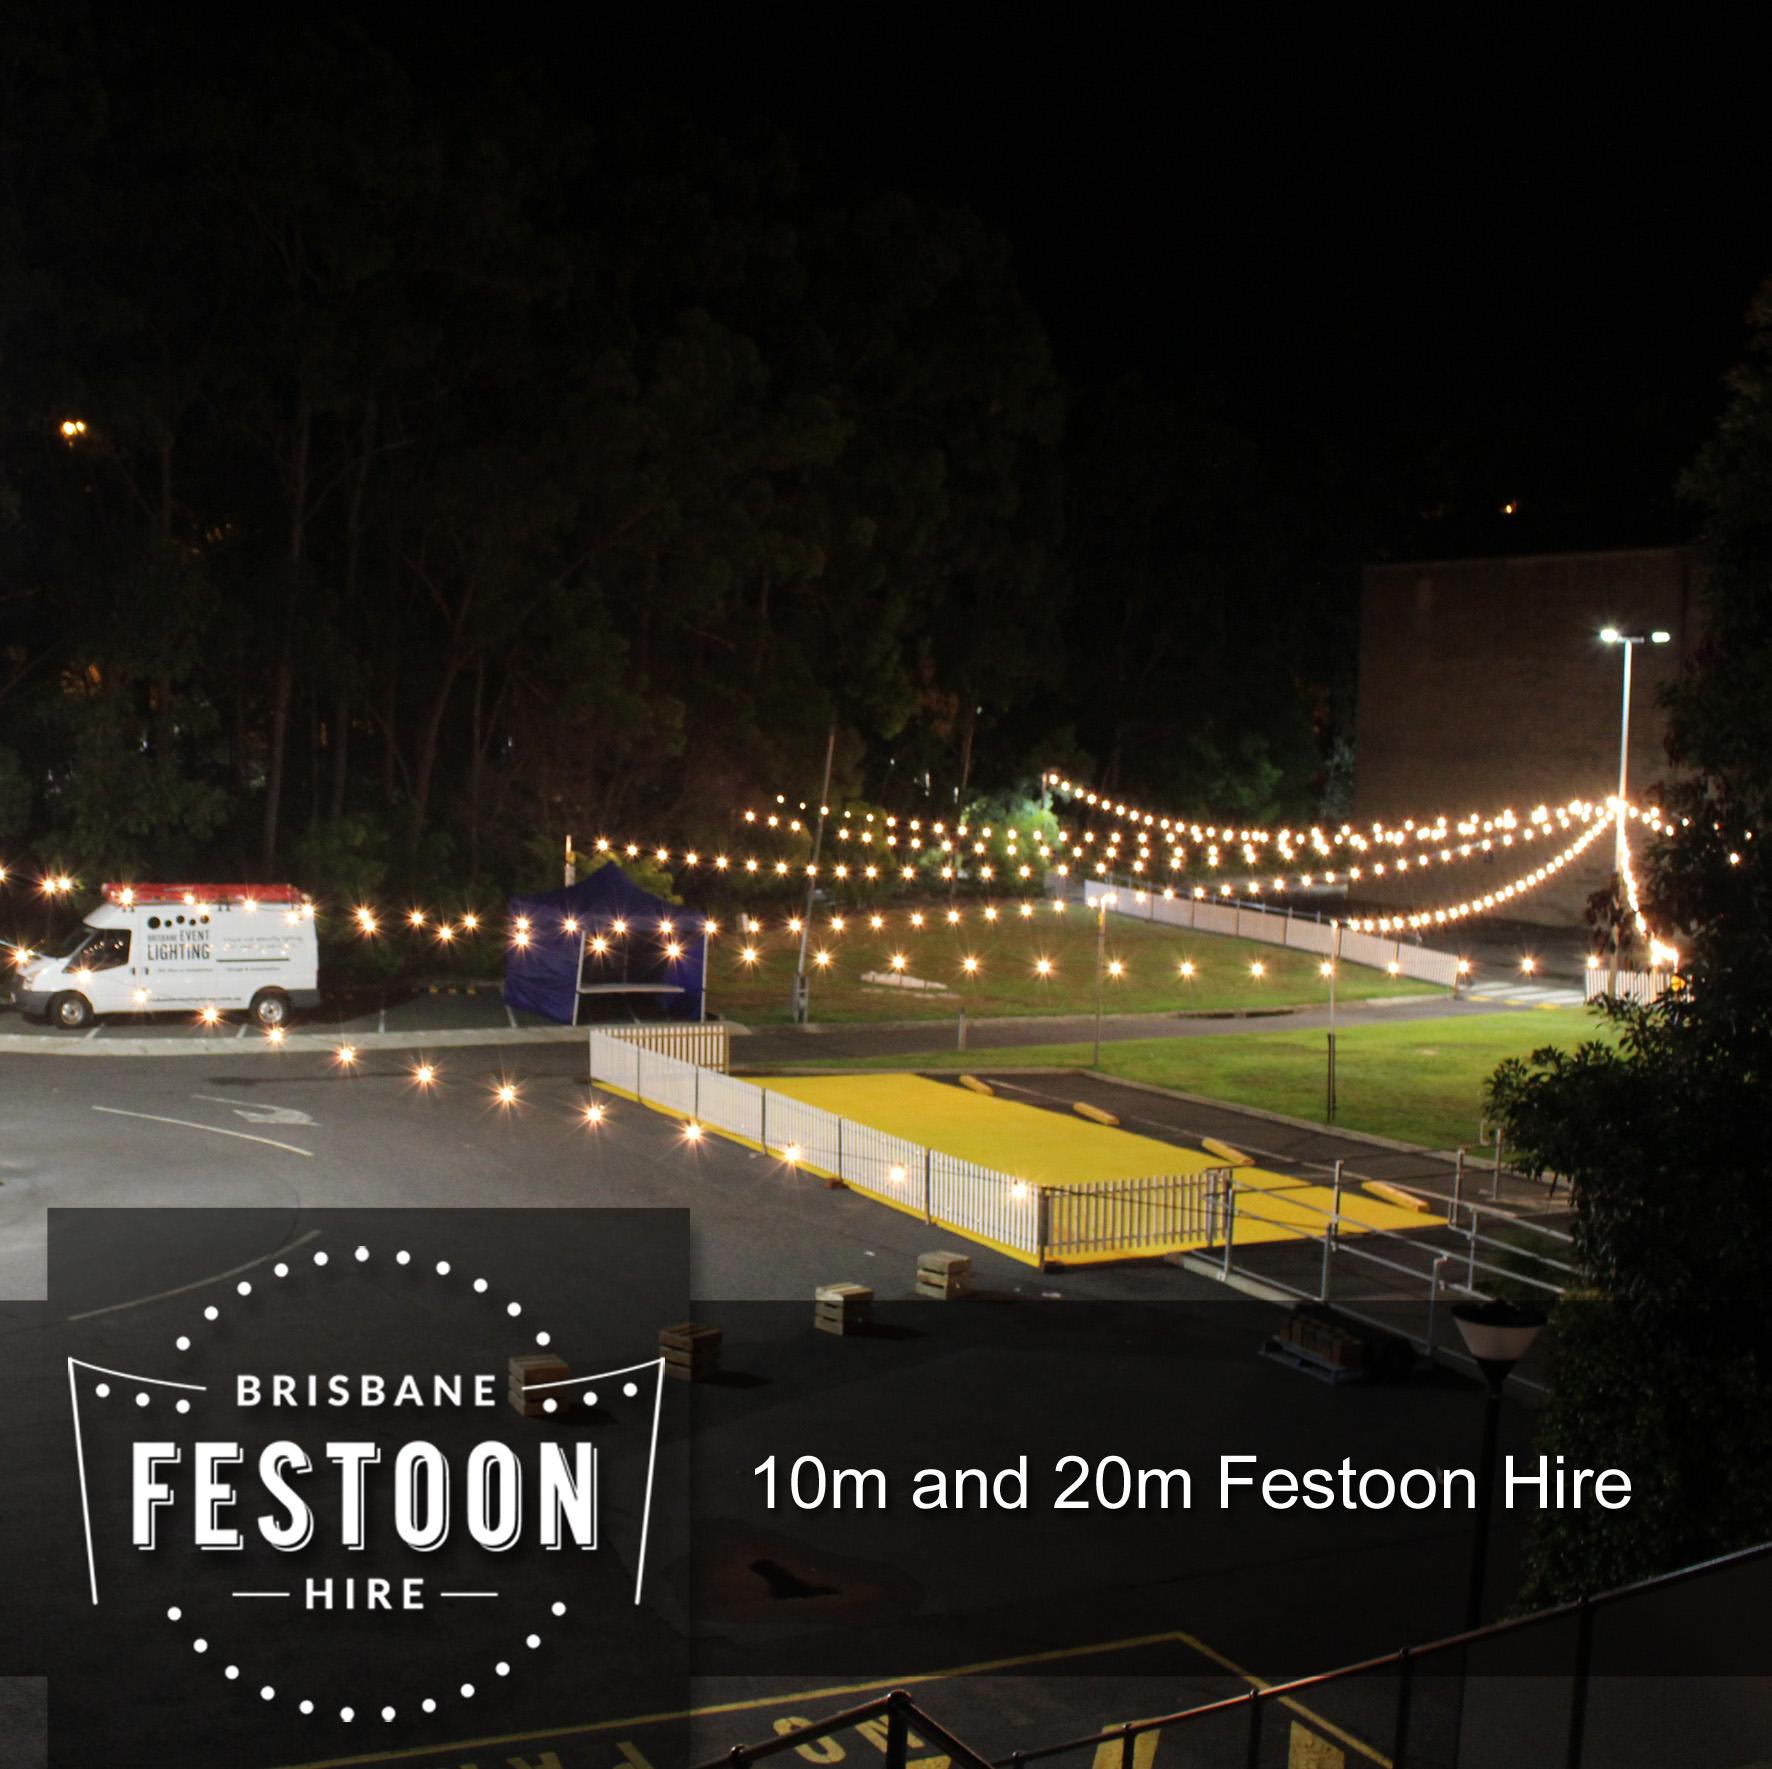 Brisbane Festoon Hire - 10m and 20m Festoon Hire 3.jpg